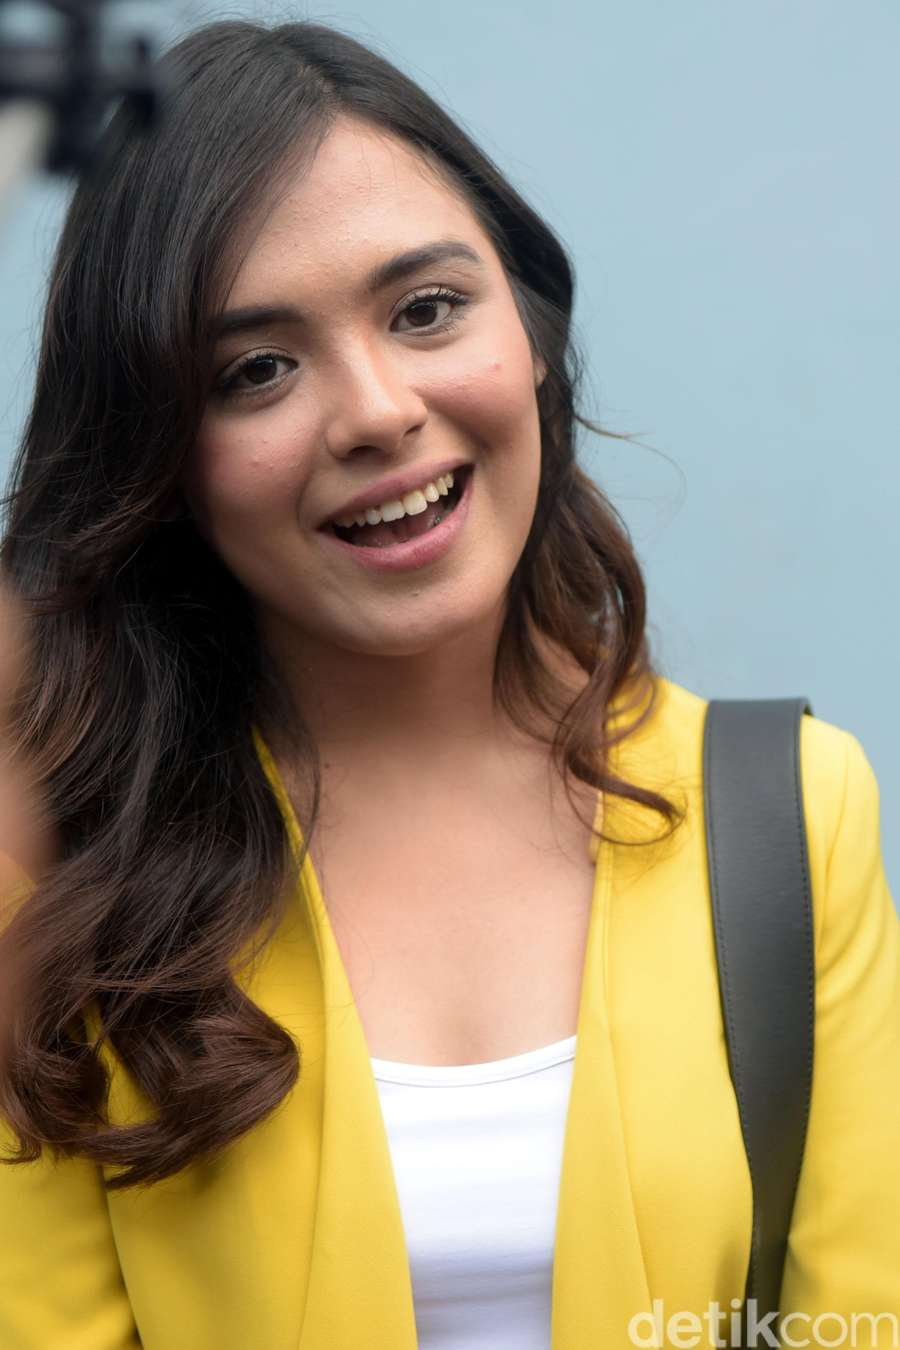 Manisnya Vebby Palwinta, Acha Septriasa hingga Senyuman Aurora Ribero